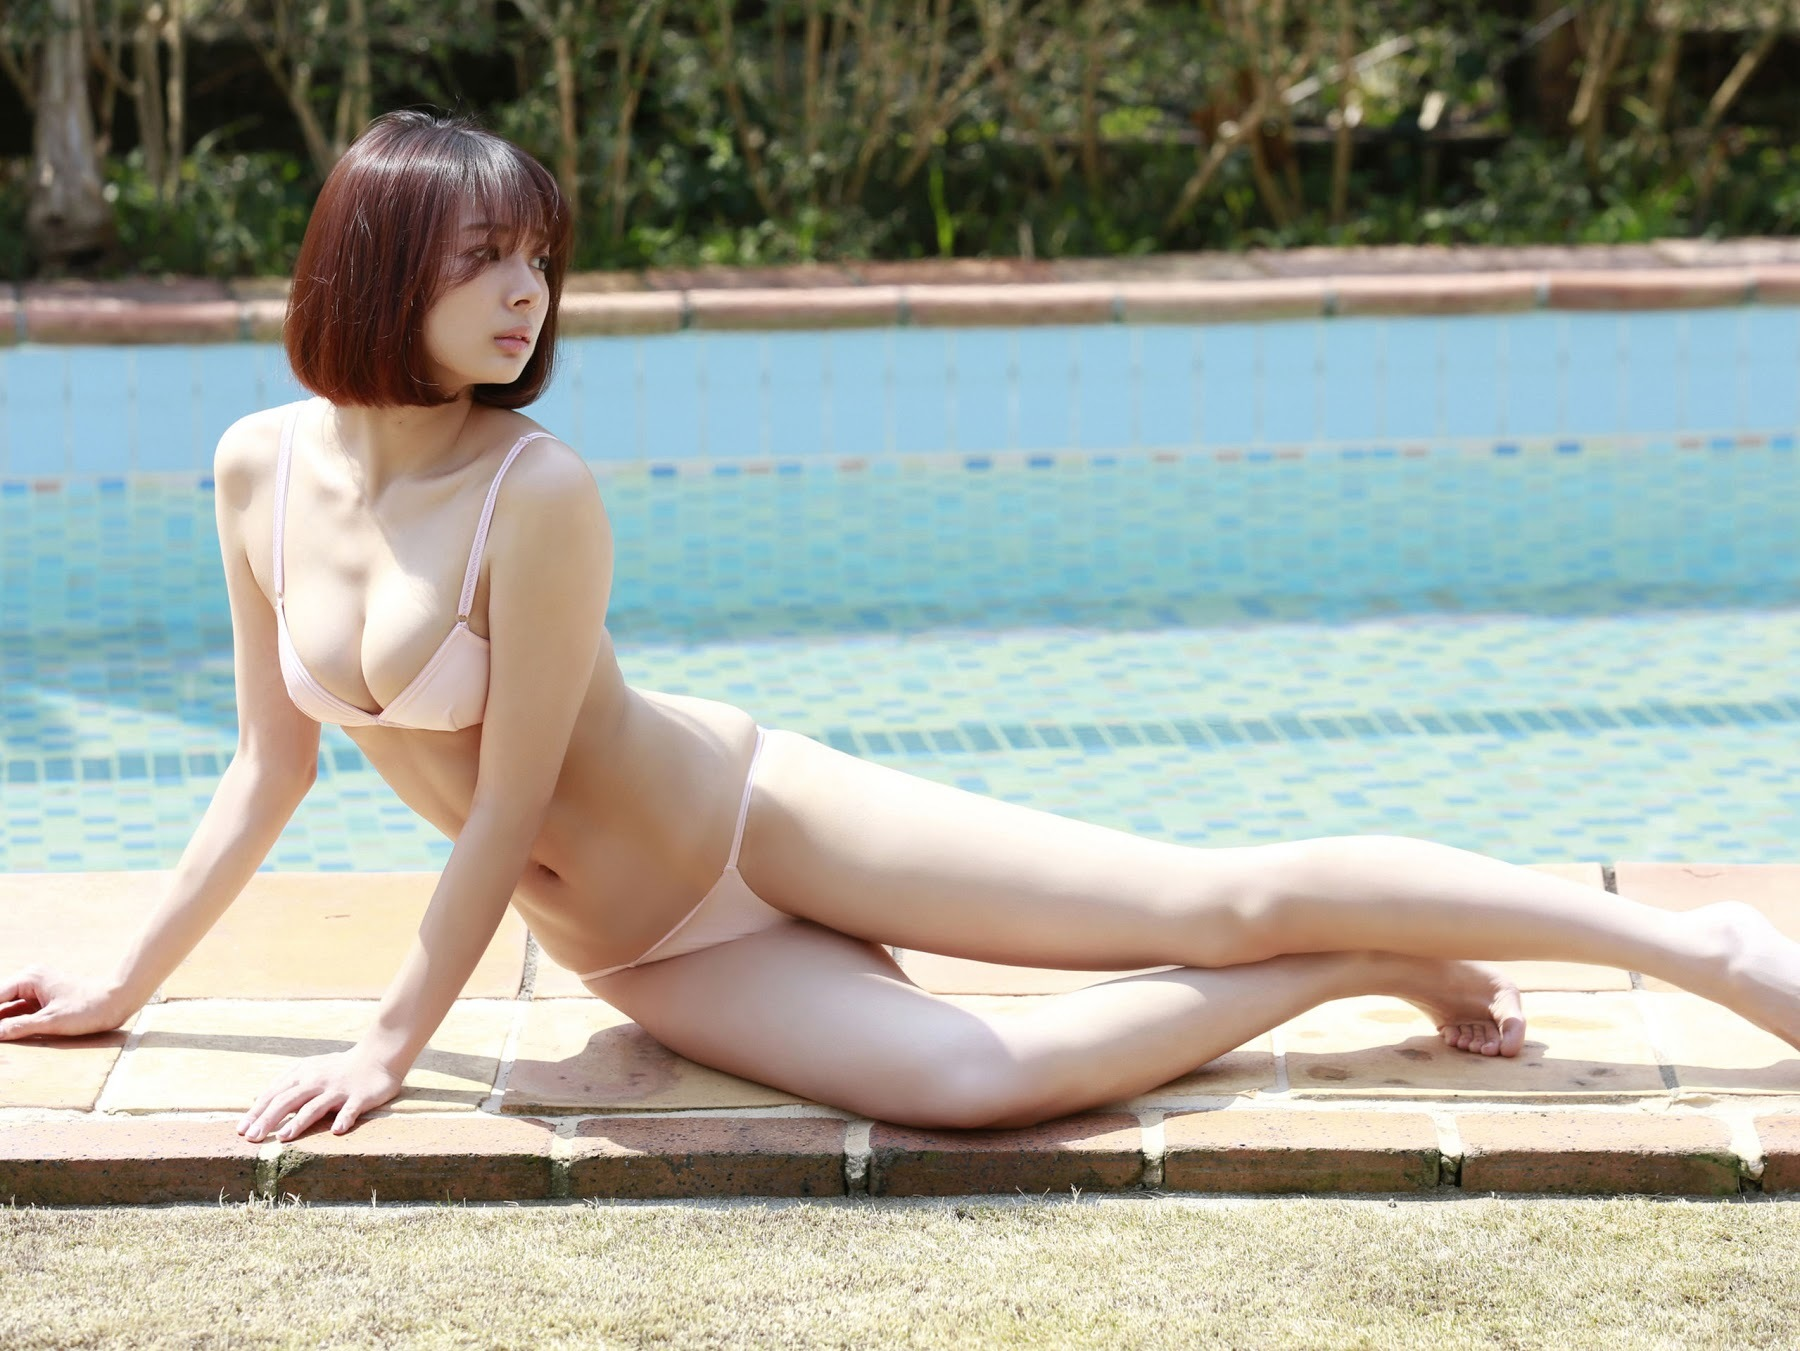 23 years old Shaka Okada, who is also a professional mahjong player008